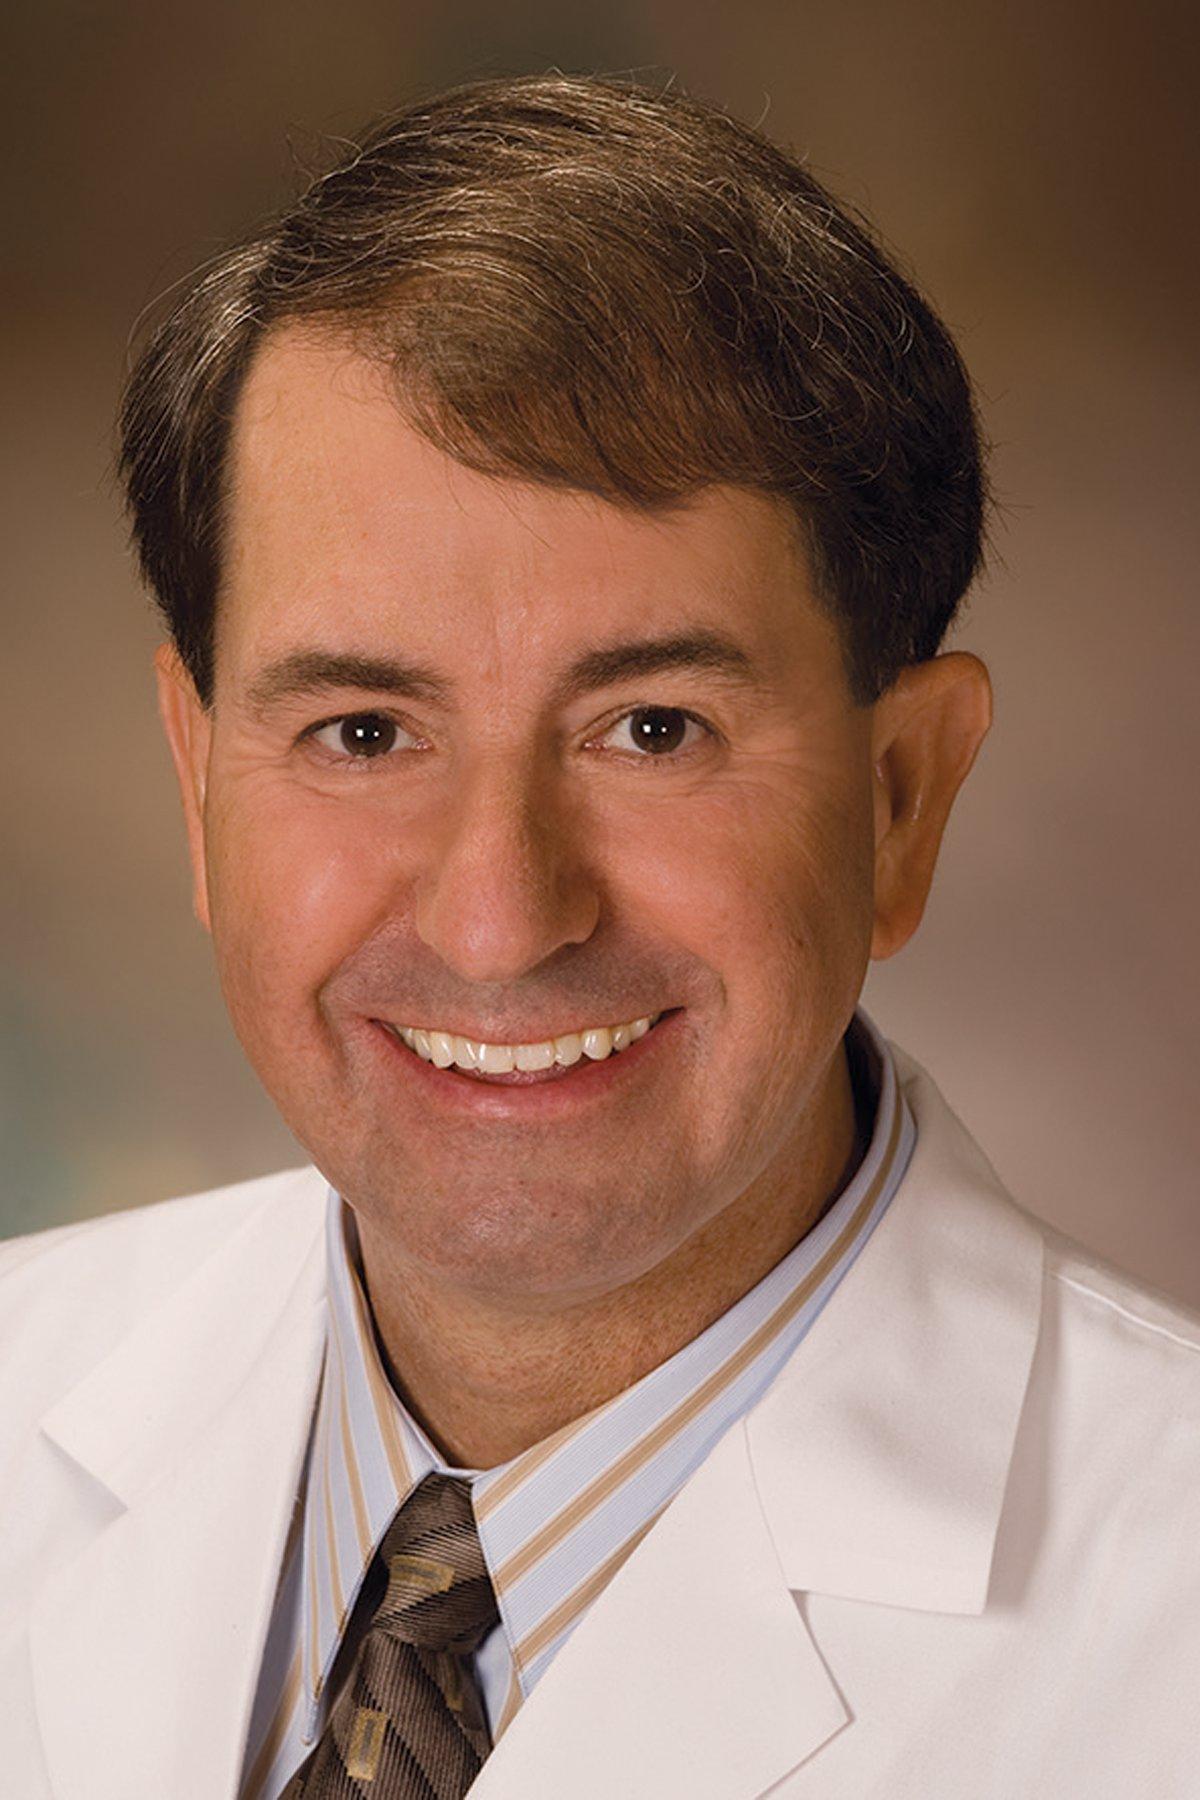 David Reeves, MD